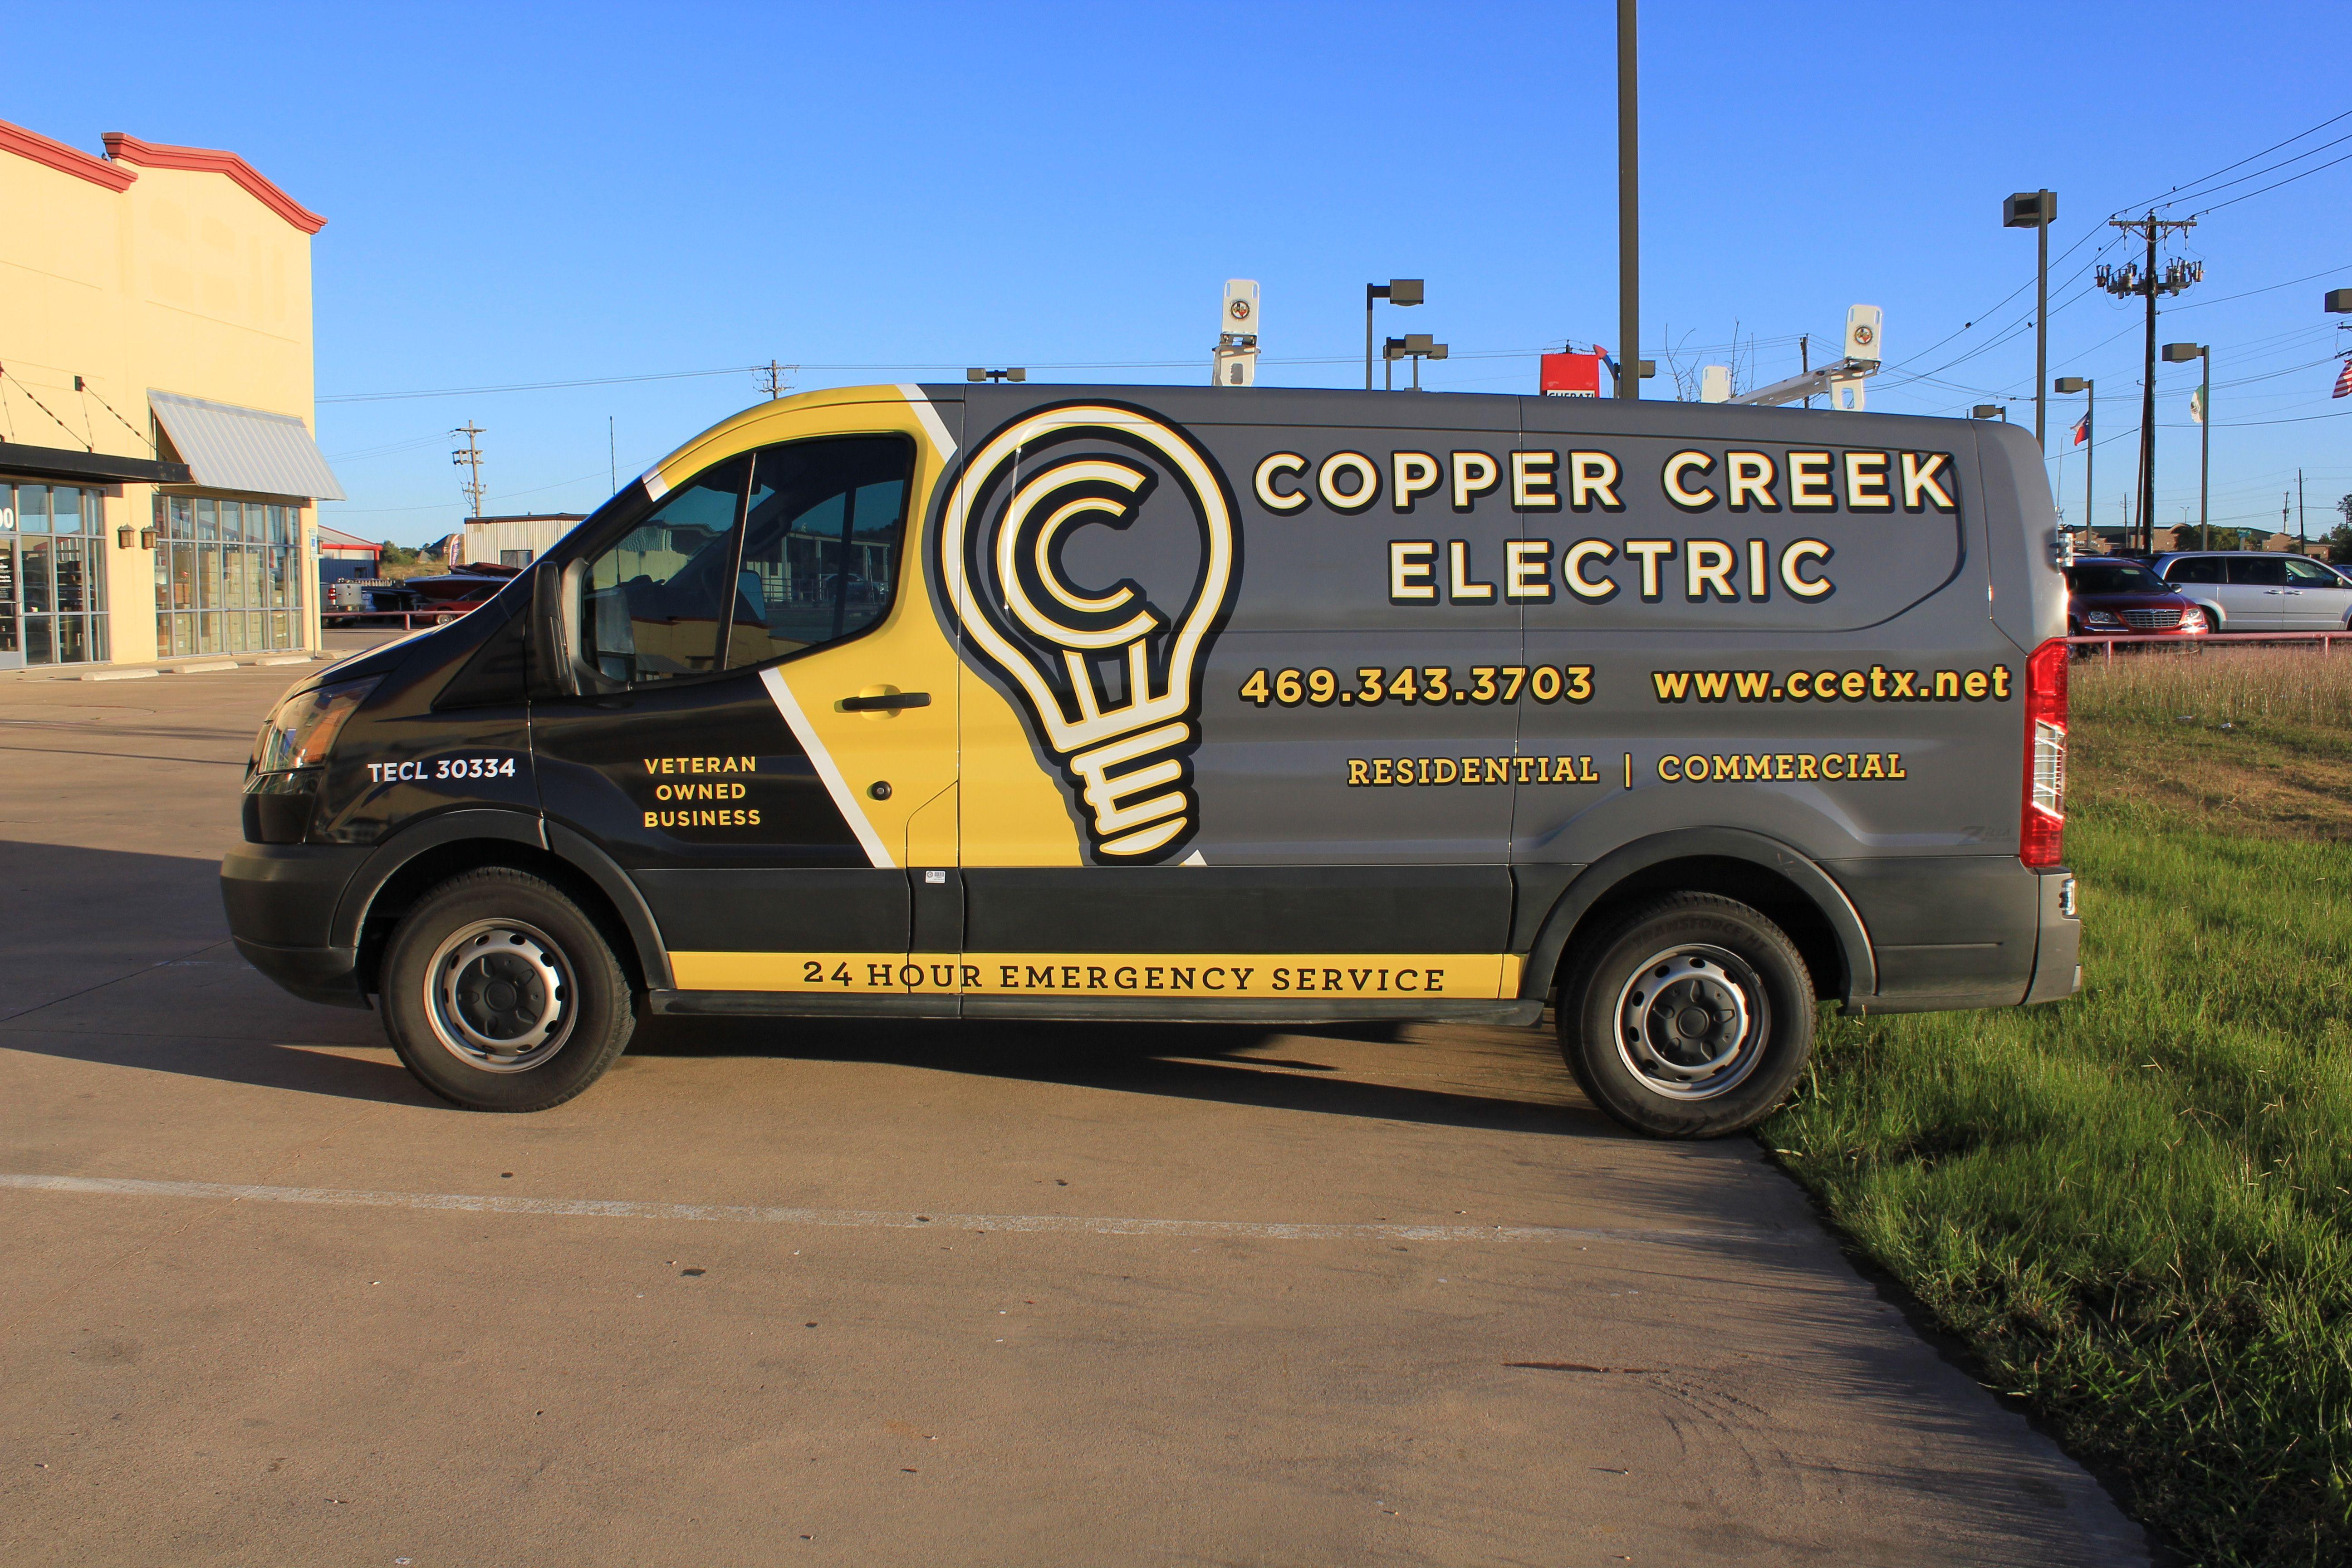 Electric Company Vehicles Van Wraps For Electric Companies Black Yellow And Grey Wraps Van Wrap Van Signage Vehicle Signage [ 3456 x 5184 Pixel ]